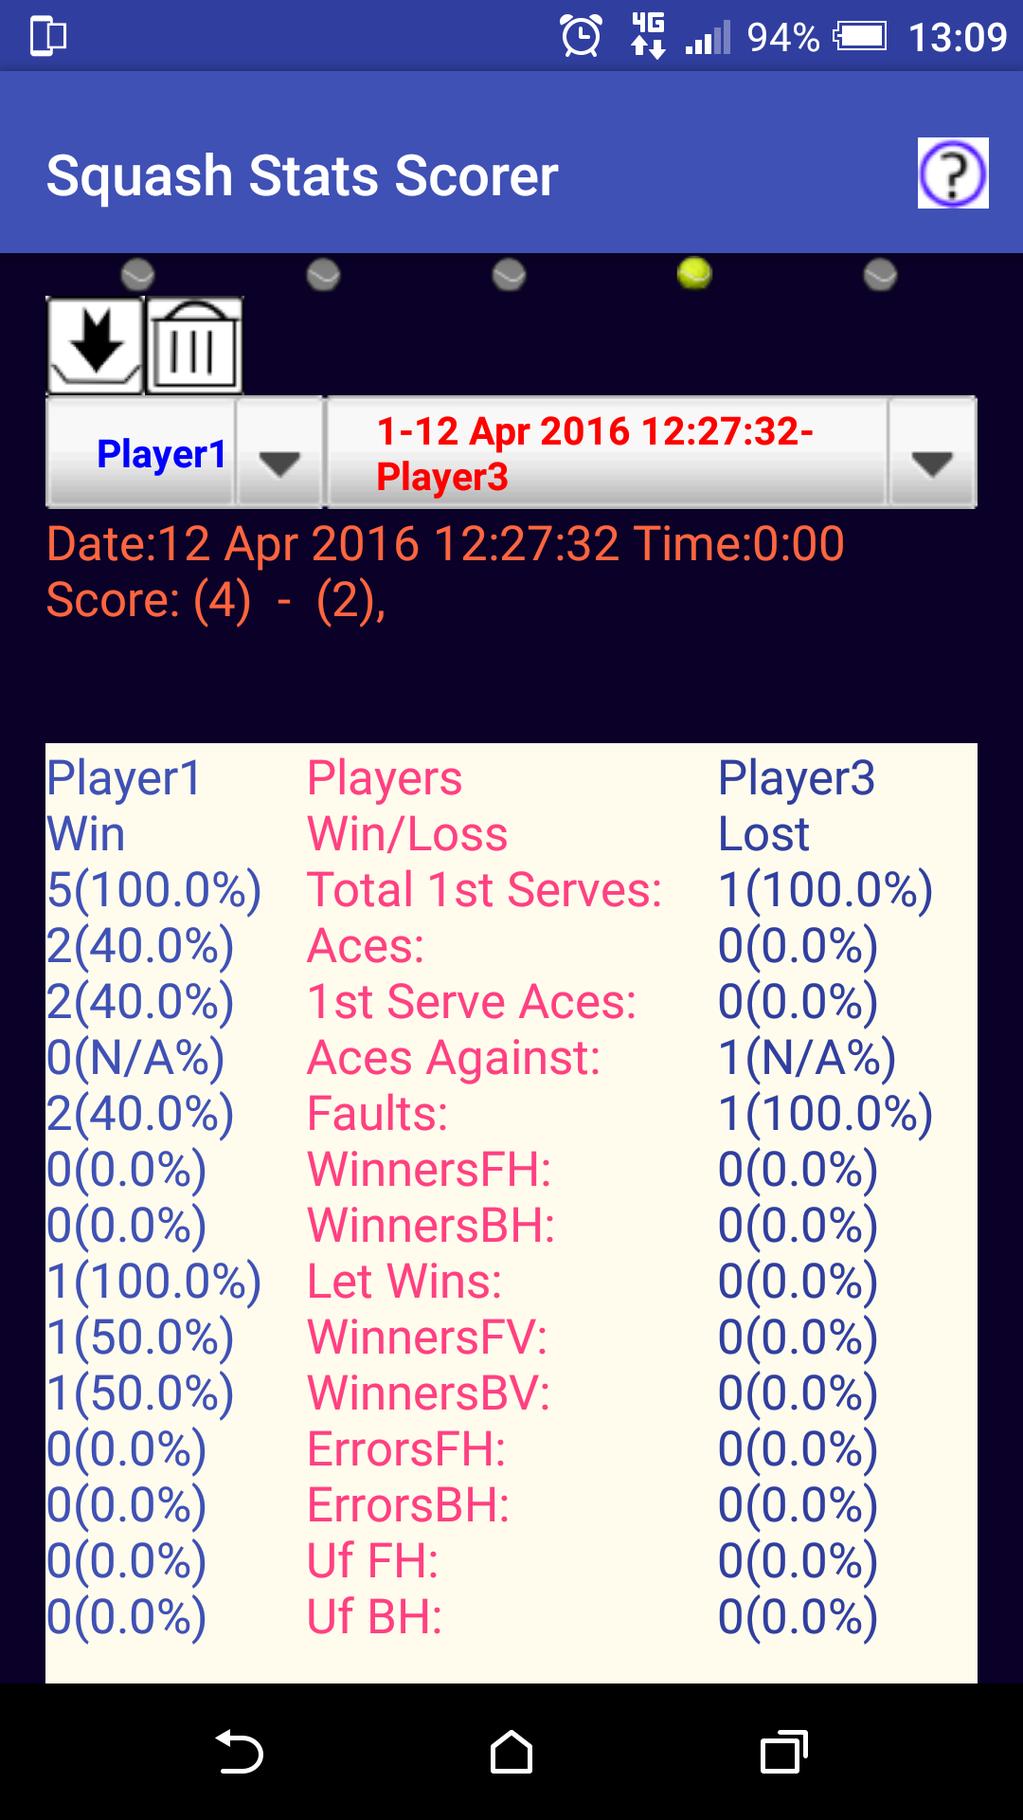 Squash Stats Scorer Screenshot 4